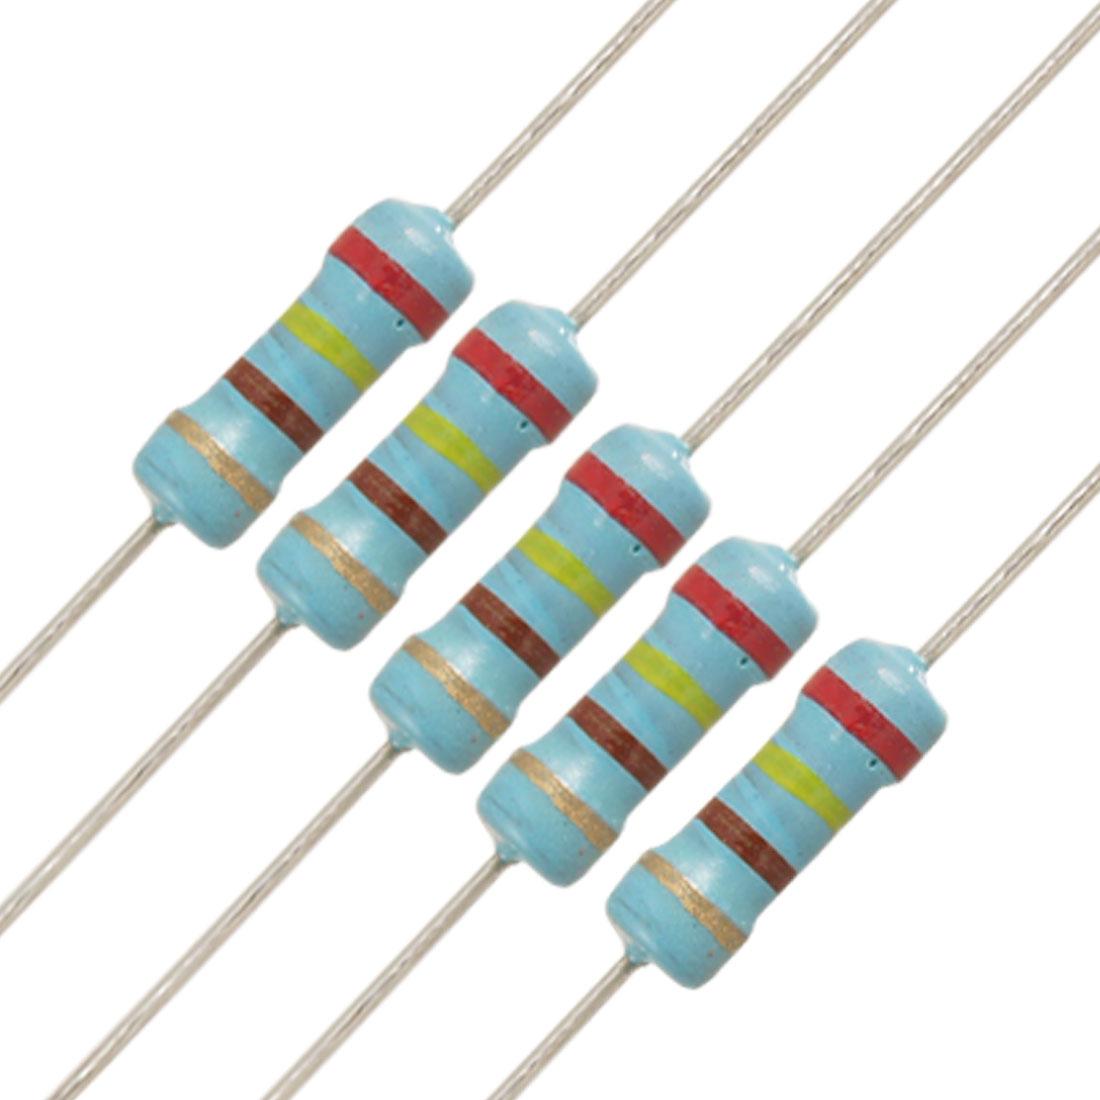 20 x 1/2W Watt 240 ohm 240R Carbon Film Resistor 0.5W